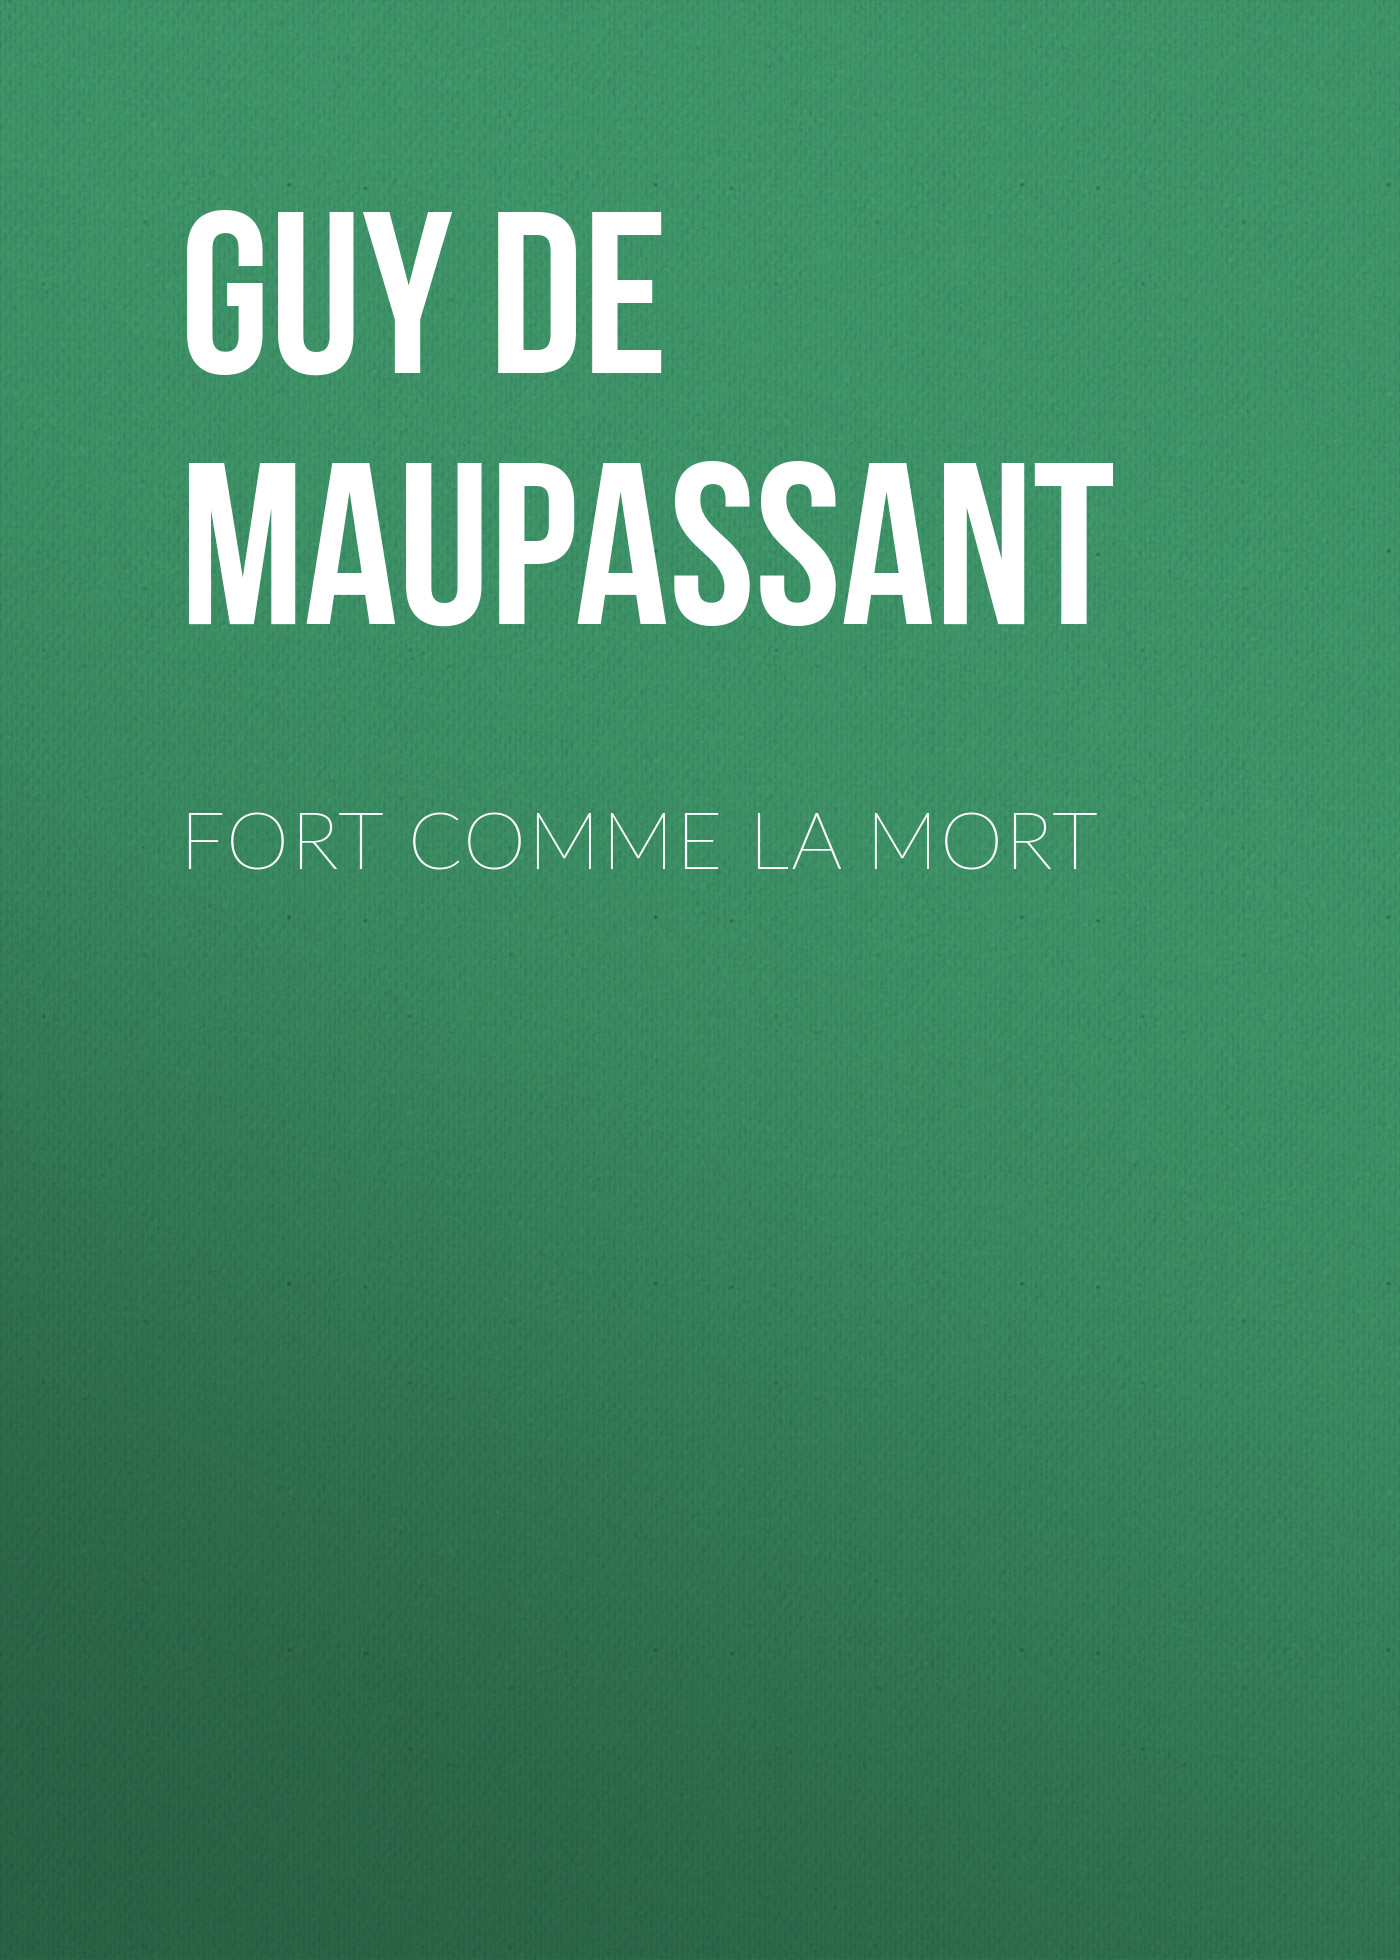 Ги де Мопассан Fort comme la mort ги де мопассан la vie errante